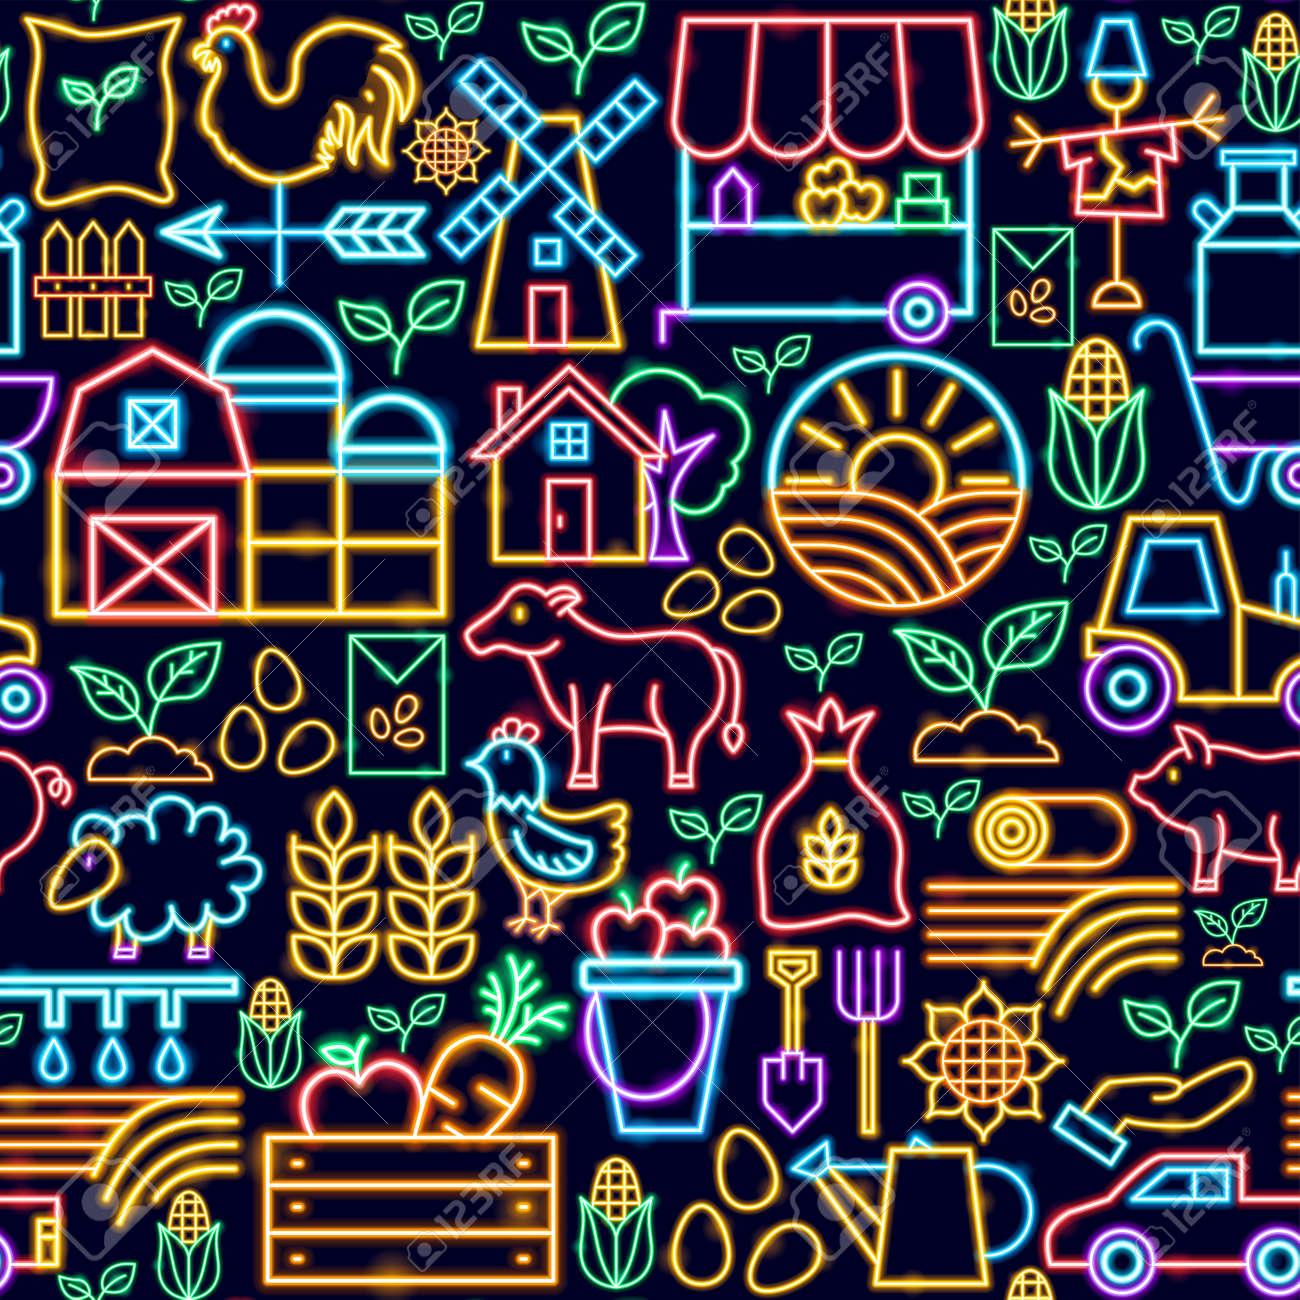 Farming Seamless Neon Pattern - 169264479